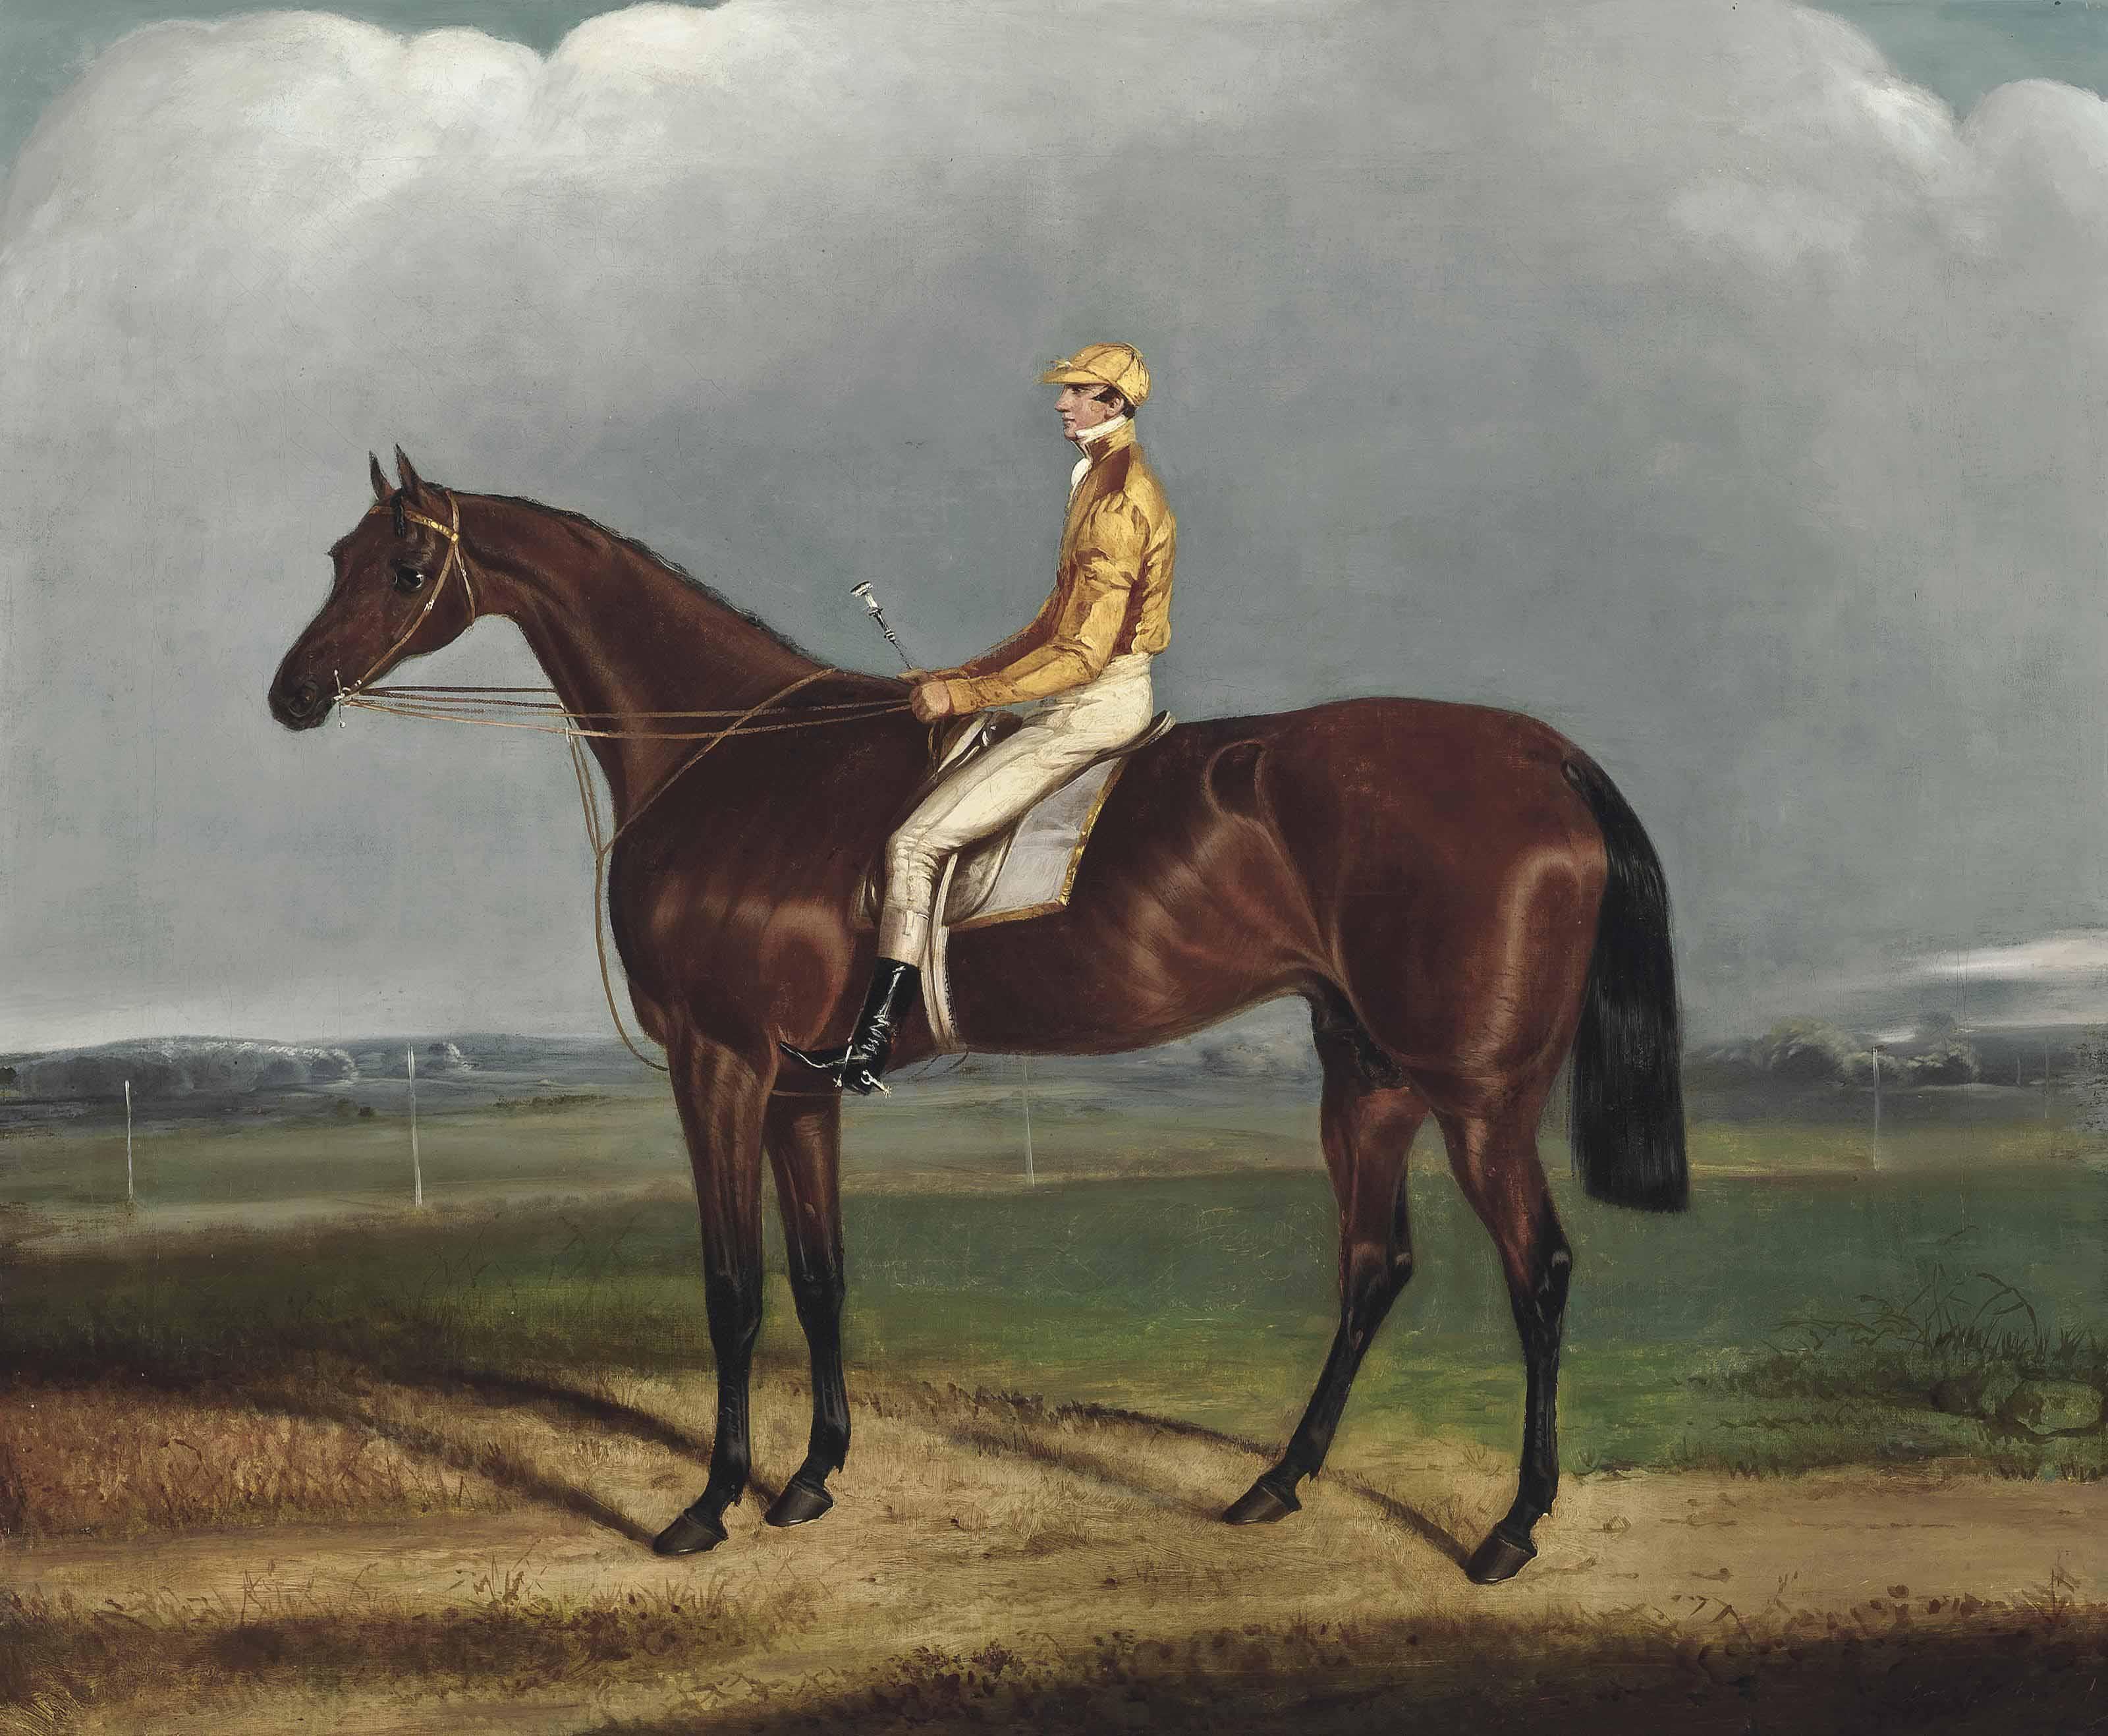 'Galaor', with jockey up